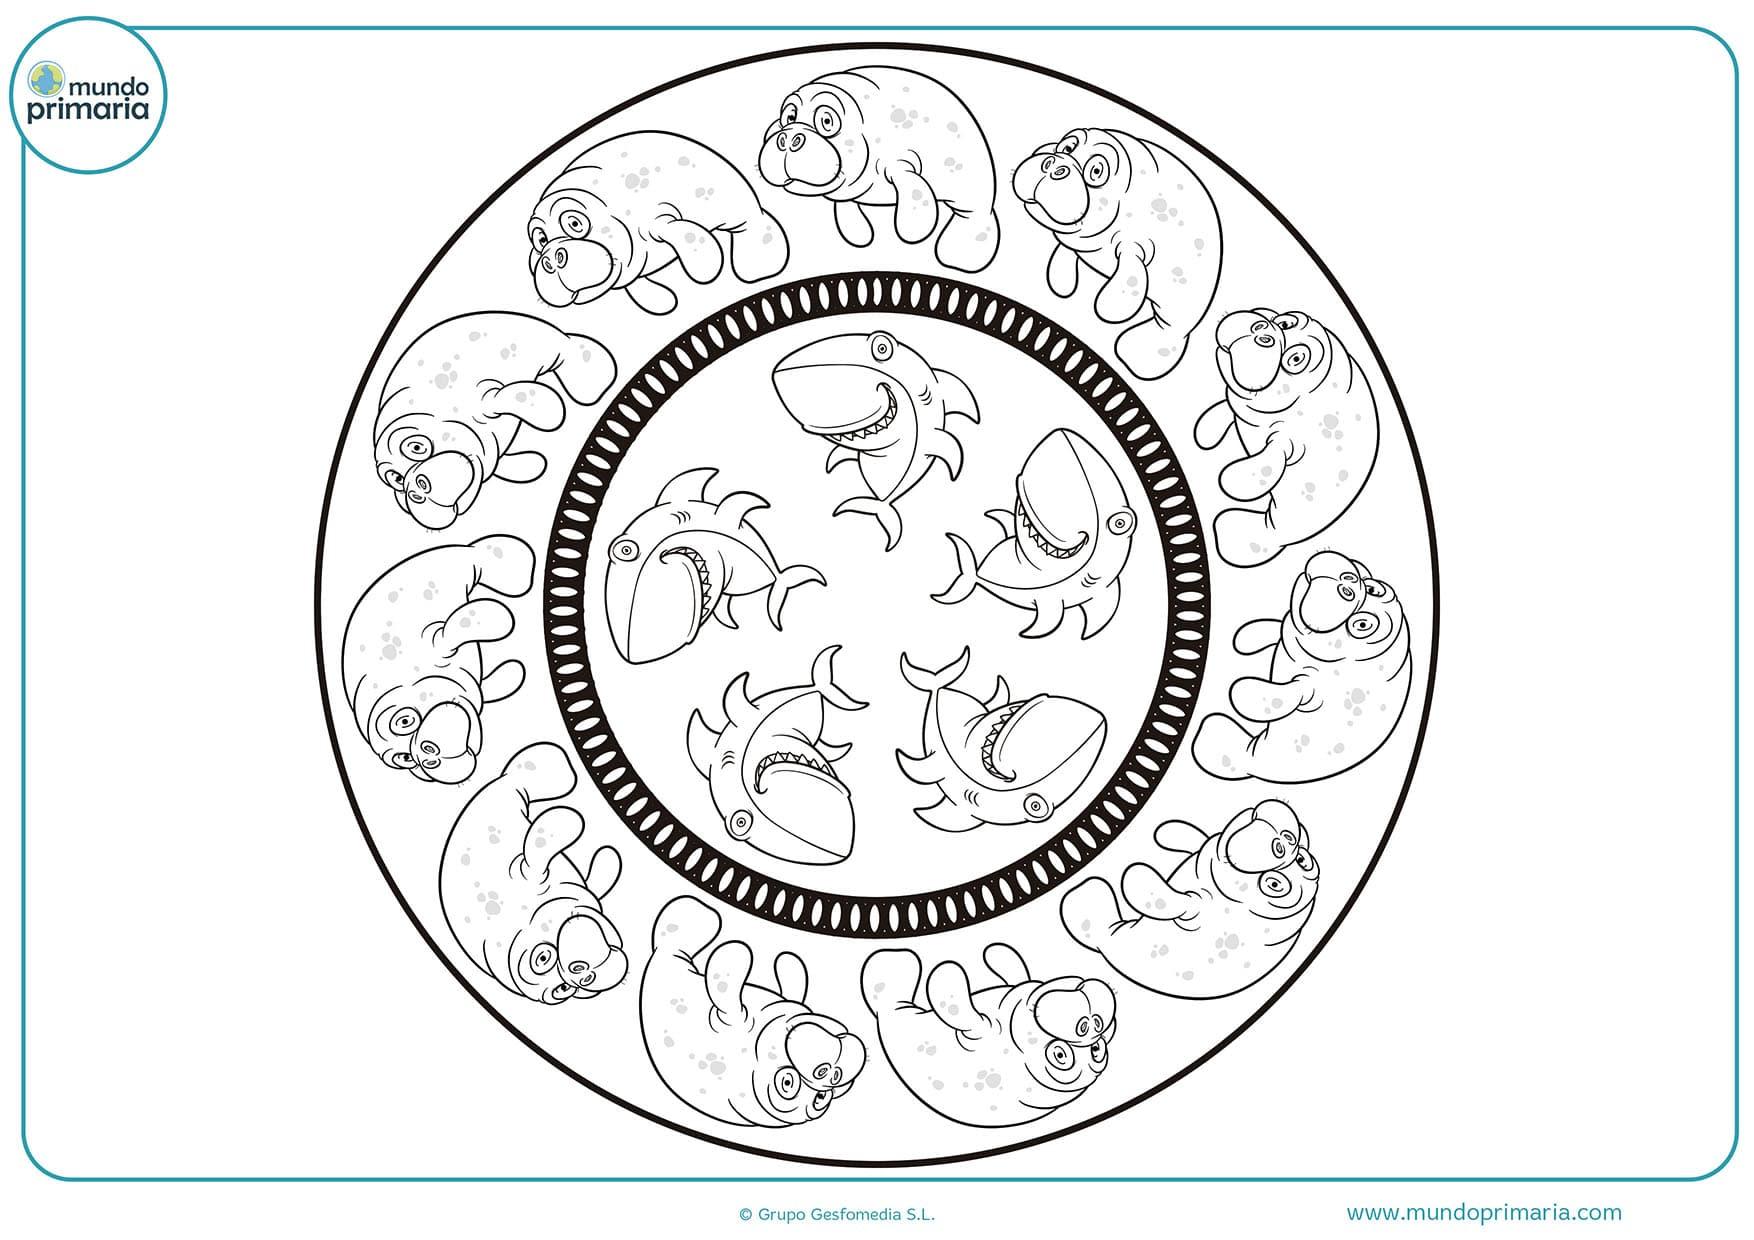 Dibujos colorear mandalas animales primaria